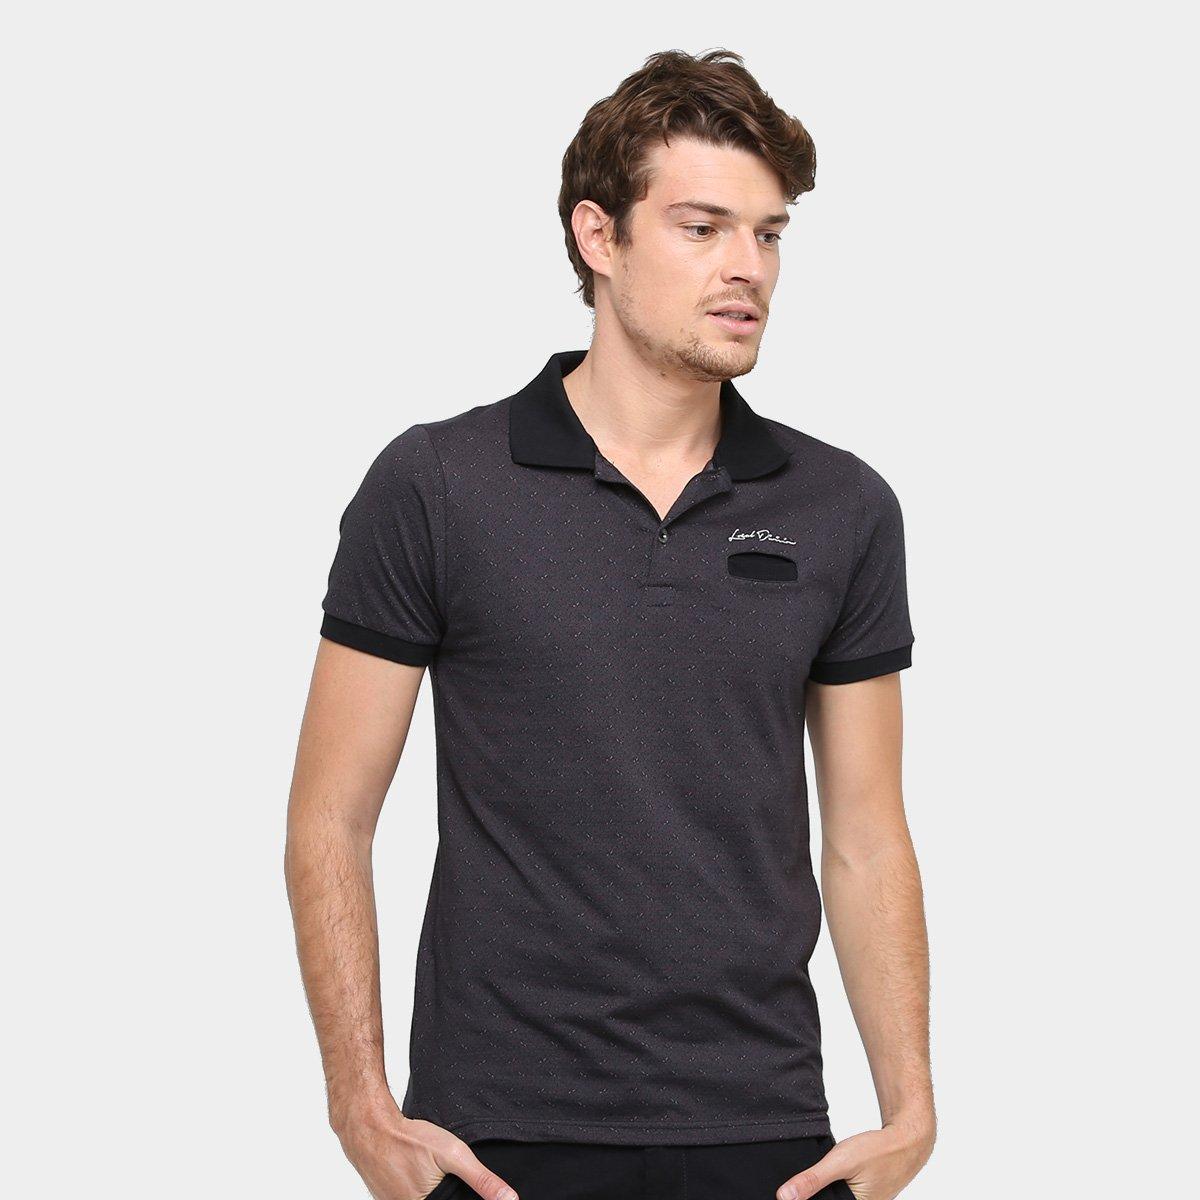 f35cb05848 Camisa Polo Local Malha Jaquard Bolso Masculina - Compre Agora ...